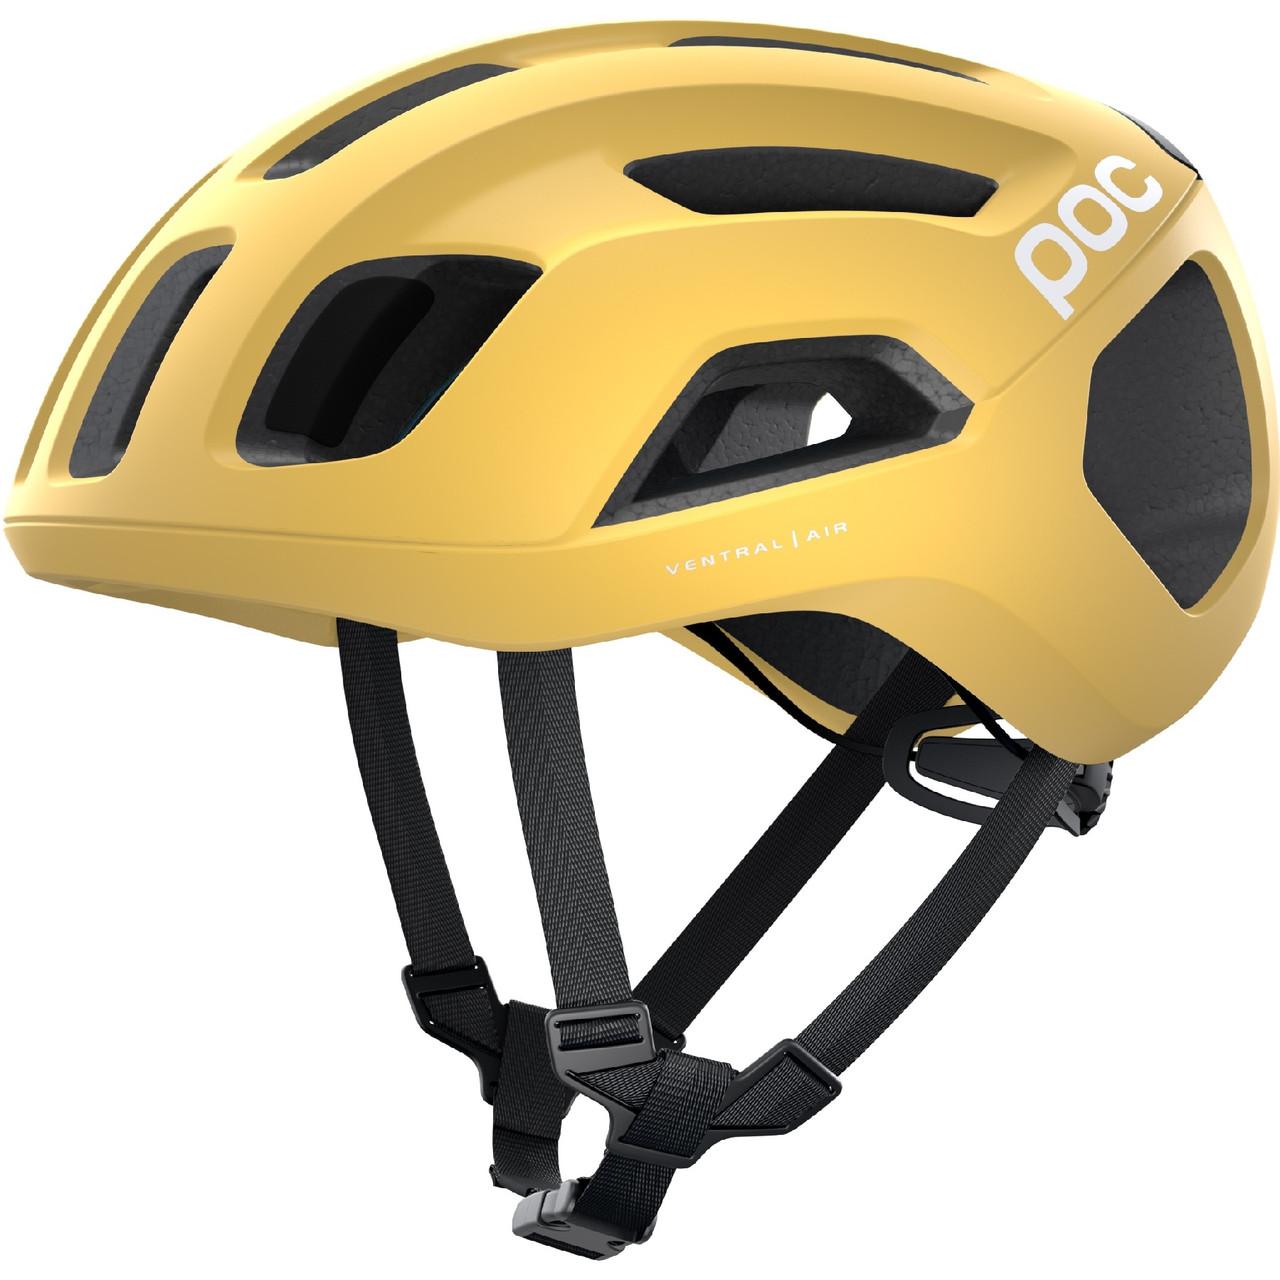 Шлем велосипедный POC Ventral Air Spin M 54-60 Sulfur Yellow Matt